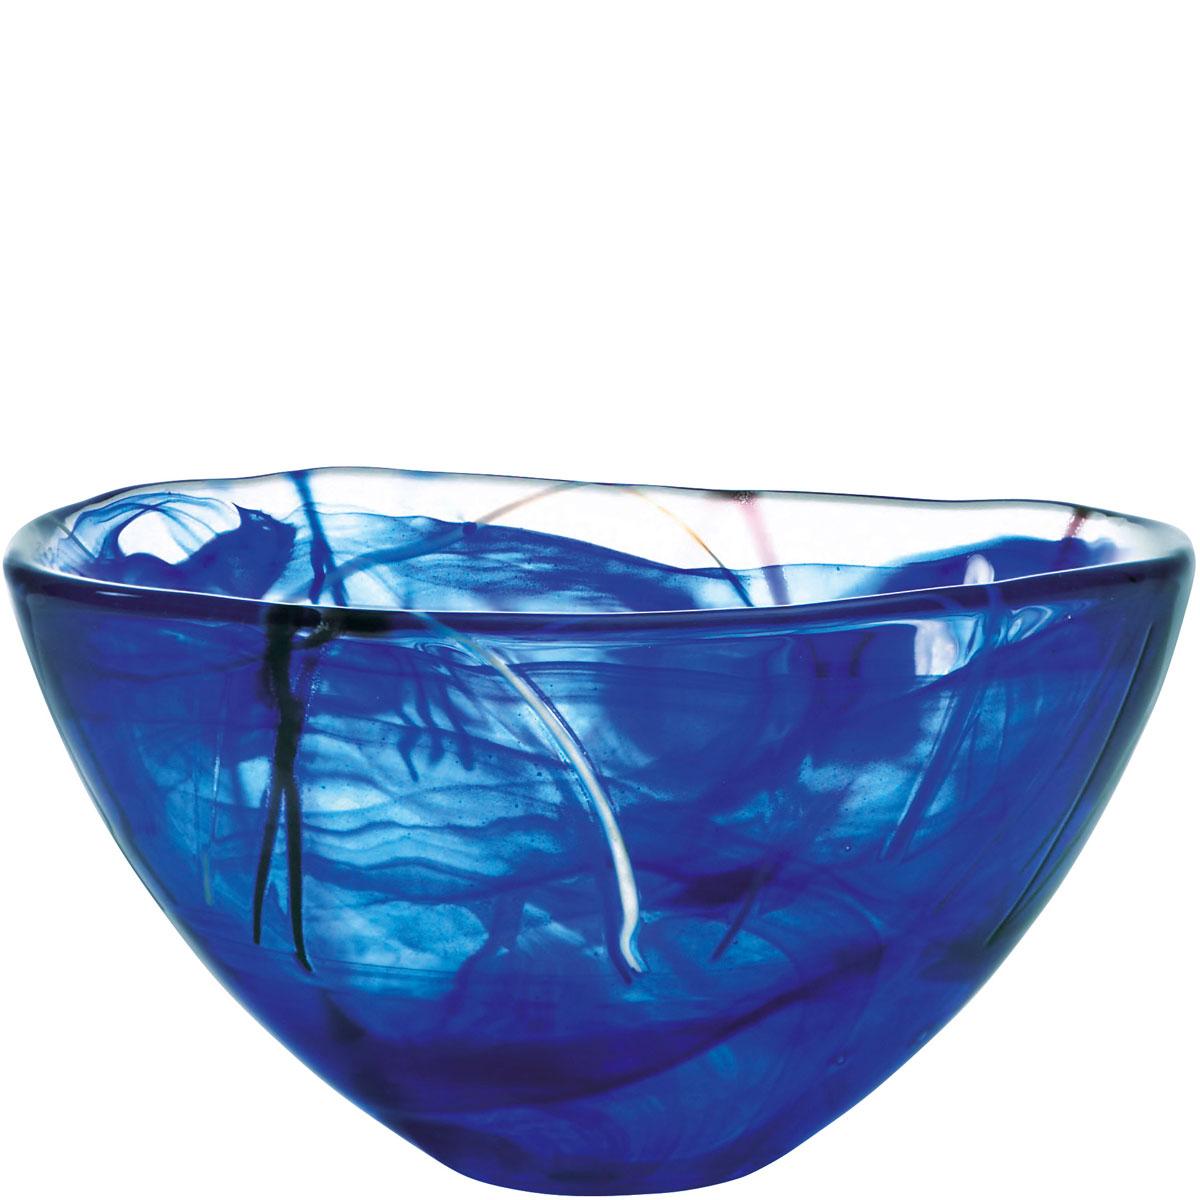 Kosta Boda Contrast Medium Crystal Bowl, Blue